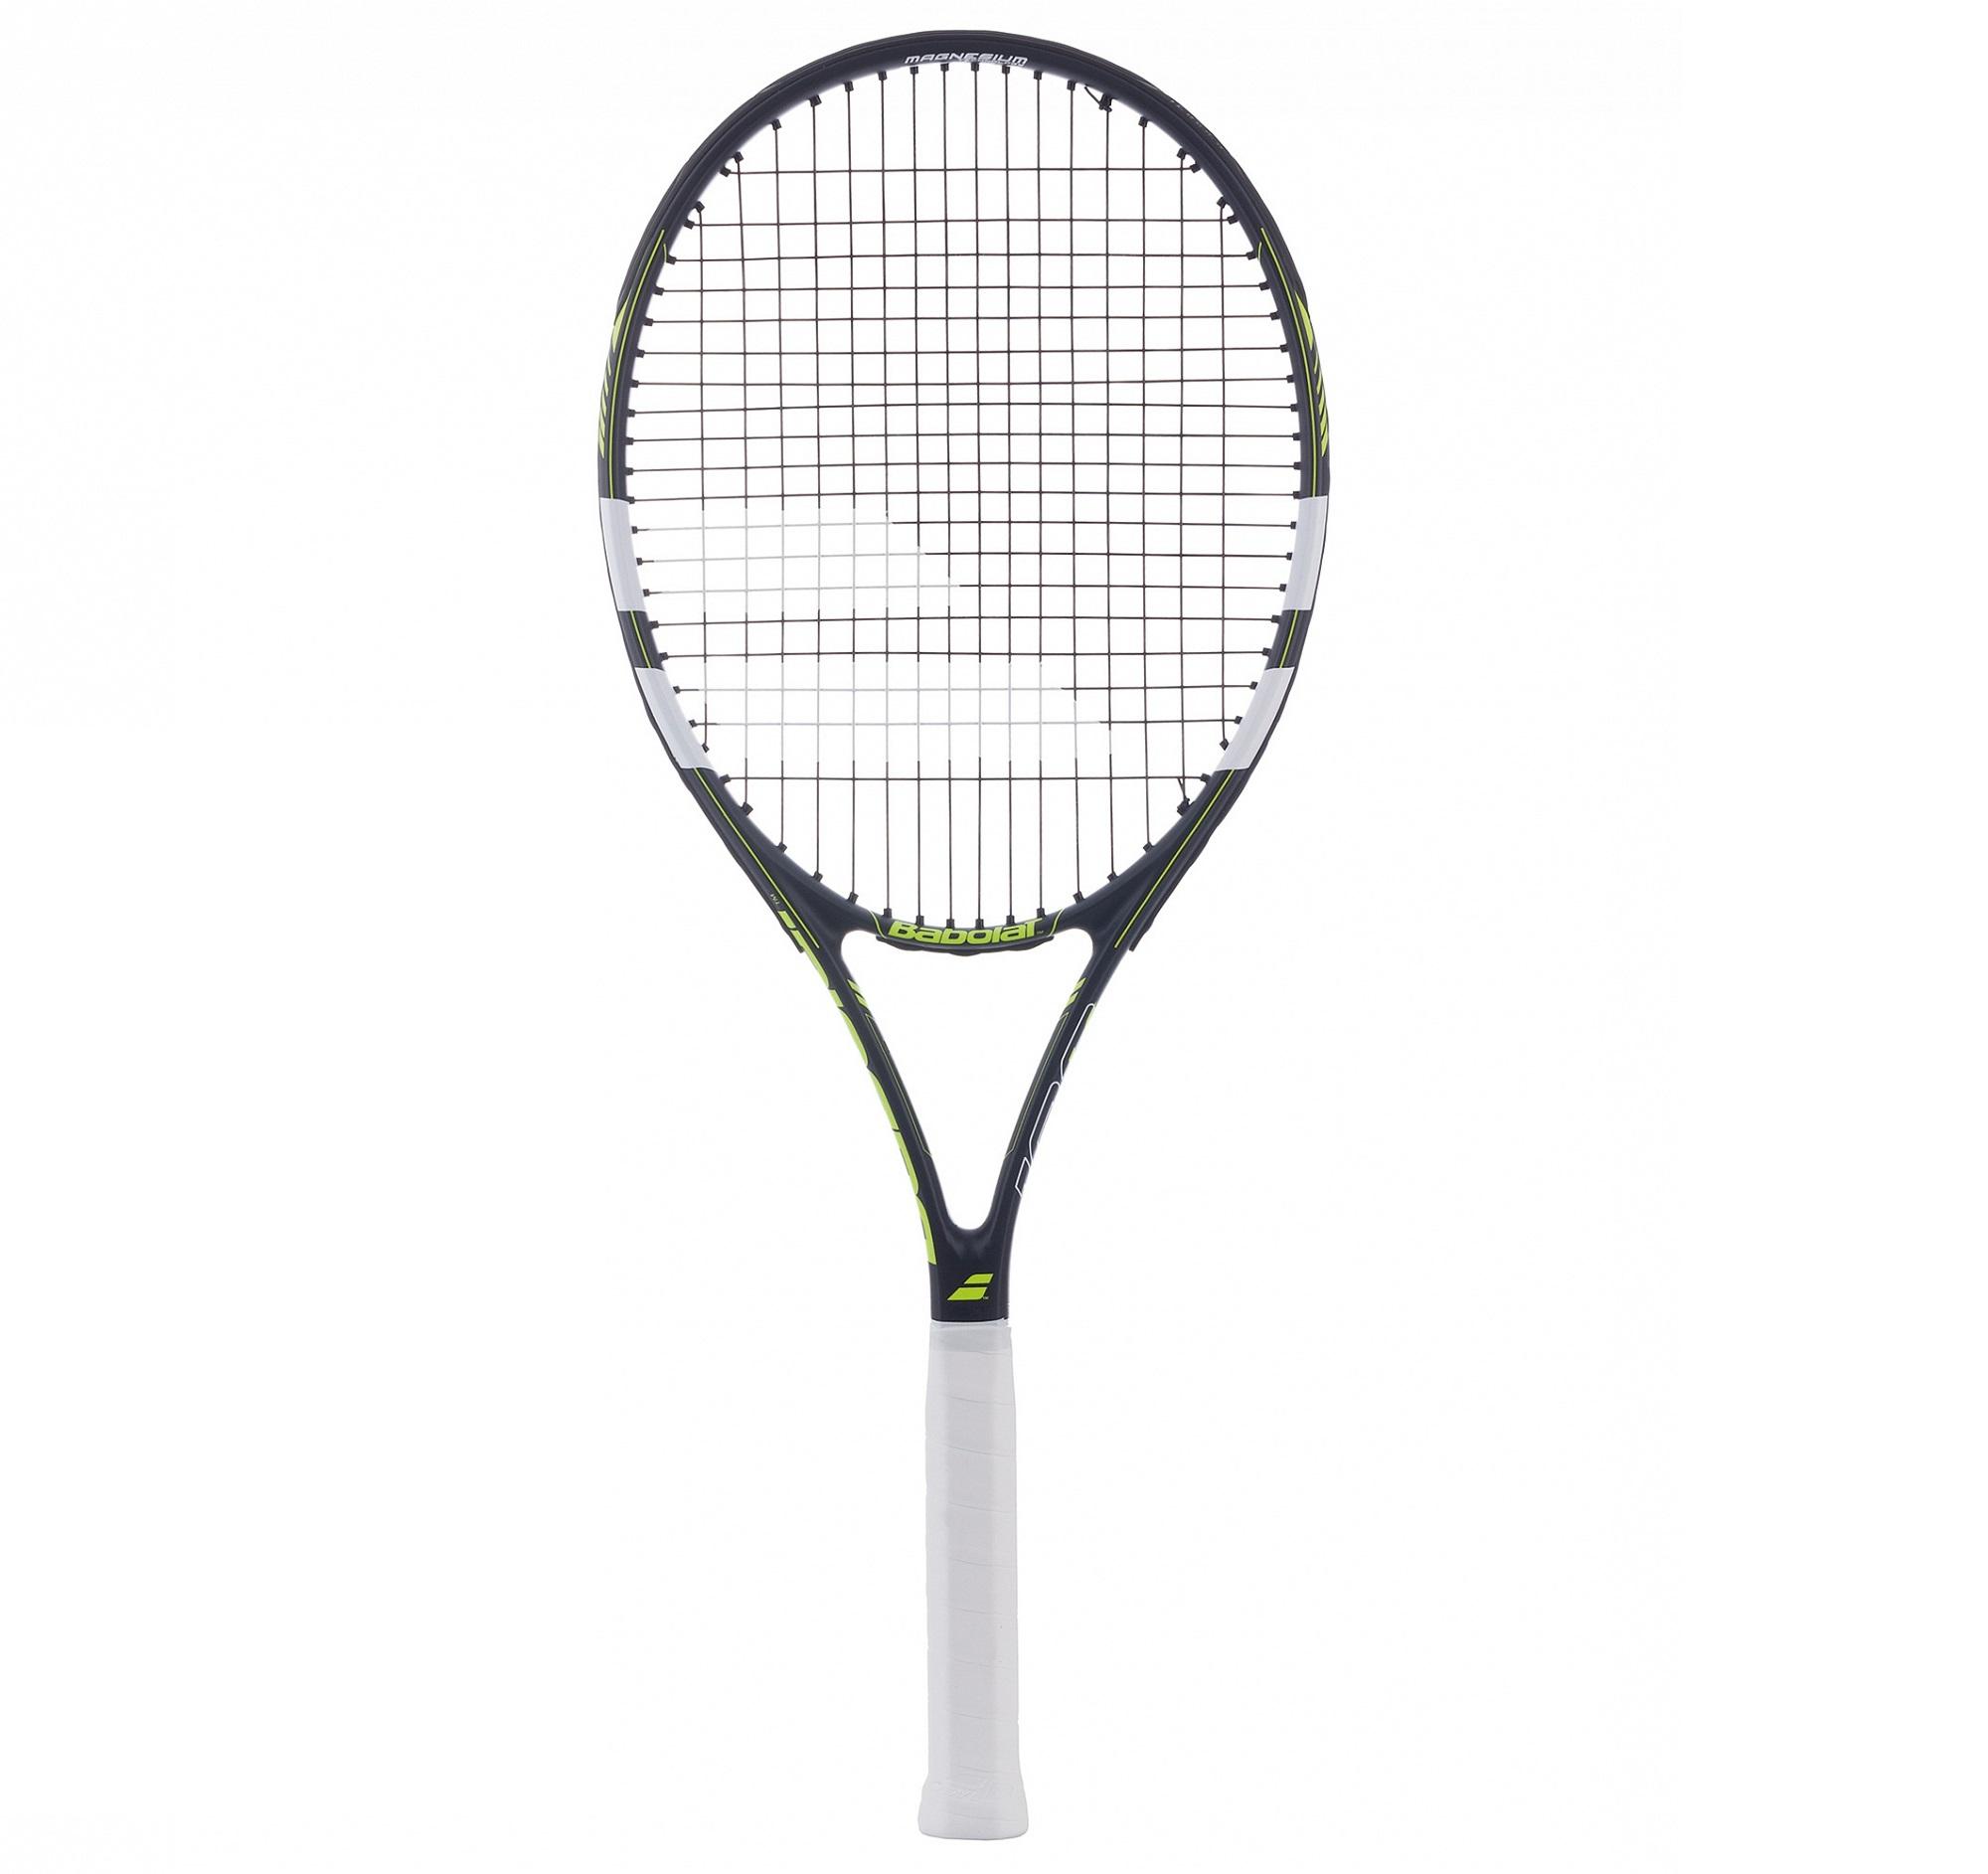 Babolat Ракетка для большого тенниса Babolat Evoke 102 babolat ракетка для большого тенниса детская babolat ballfighter 23